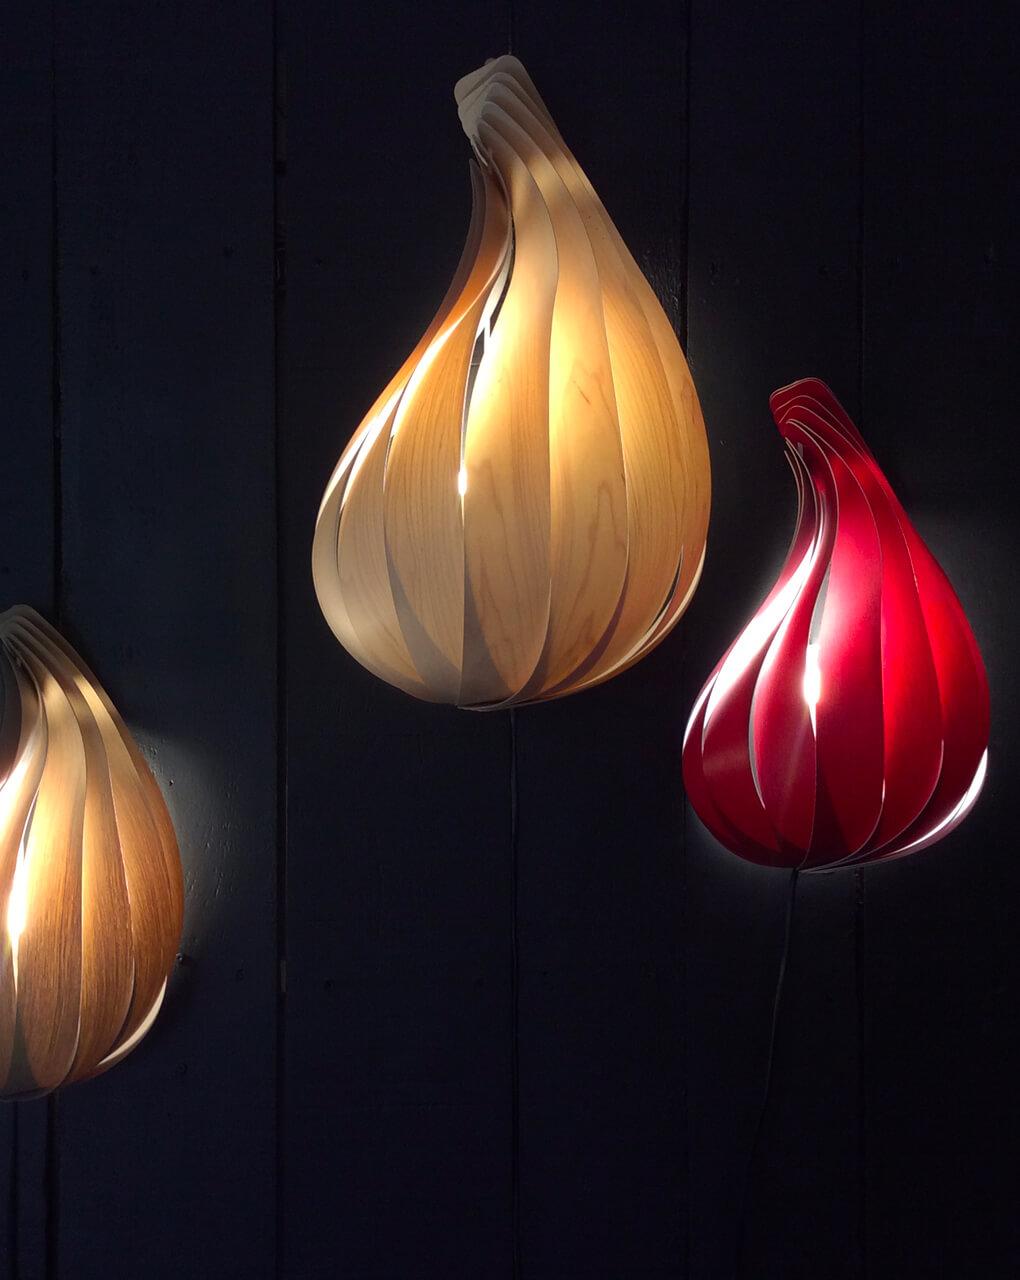 commandez la lampe applique murale twirl par vollum design. Black Bedroom Furniture Sets. Home Design Ideas